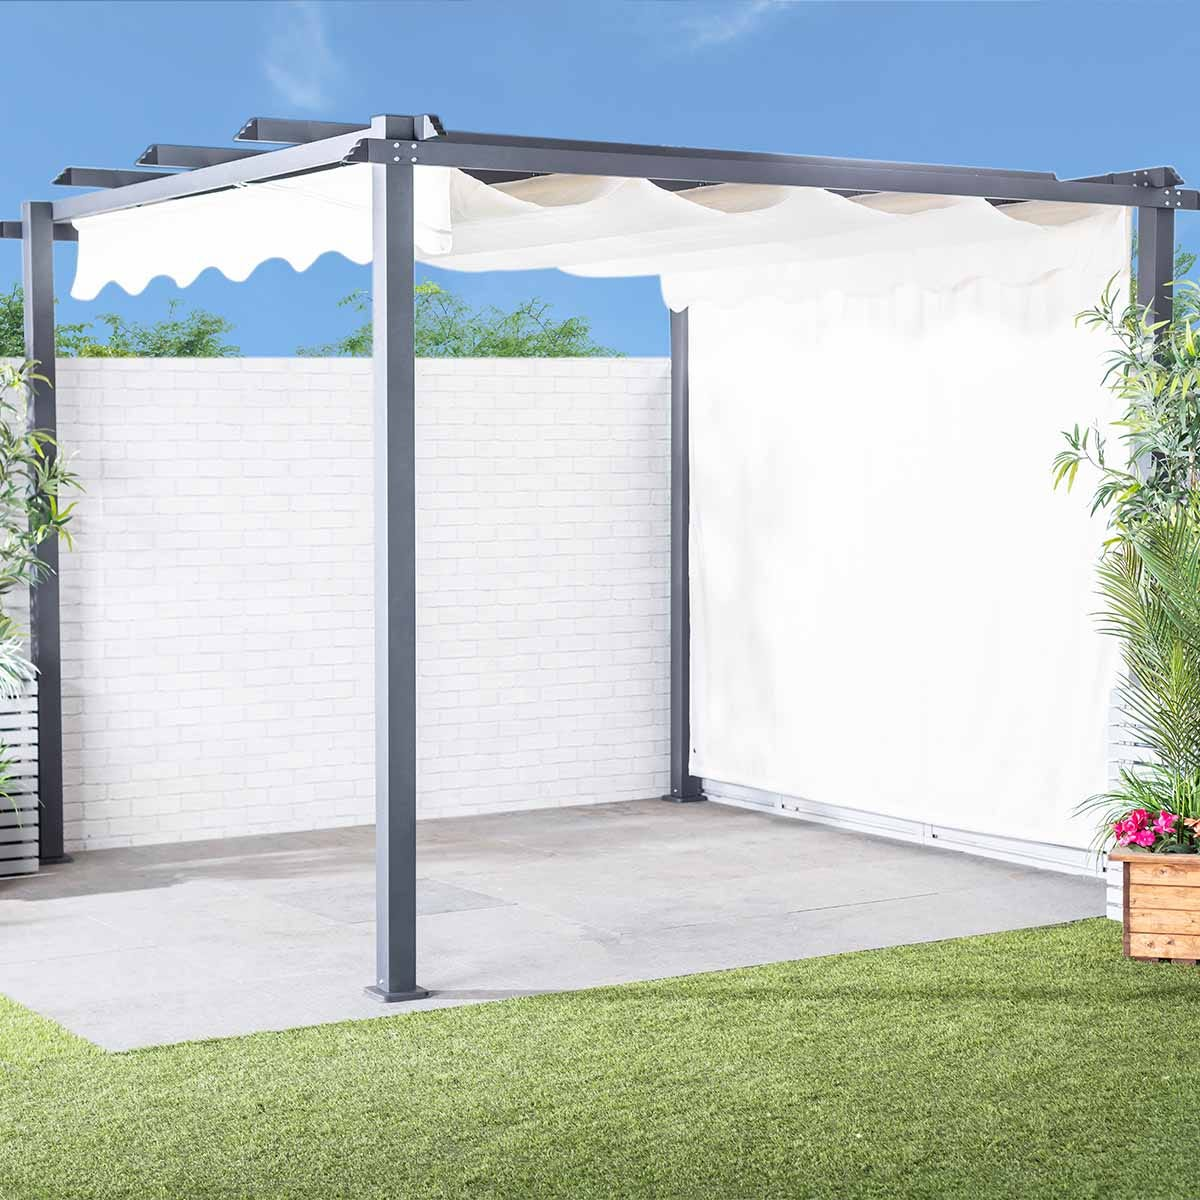 Monaco Metal Gazebo Pergola and Slide Away Sun Shade with 4 Side Panels